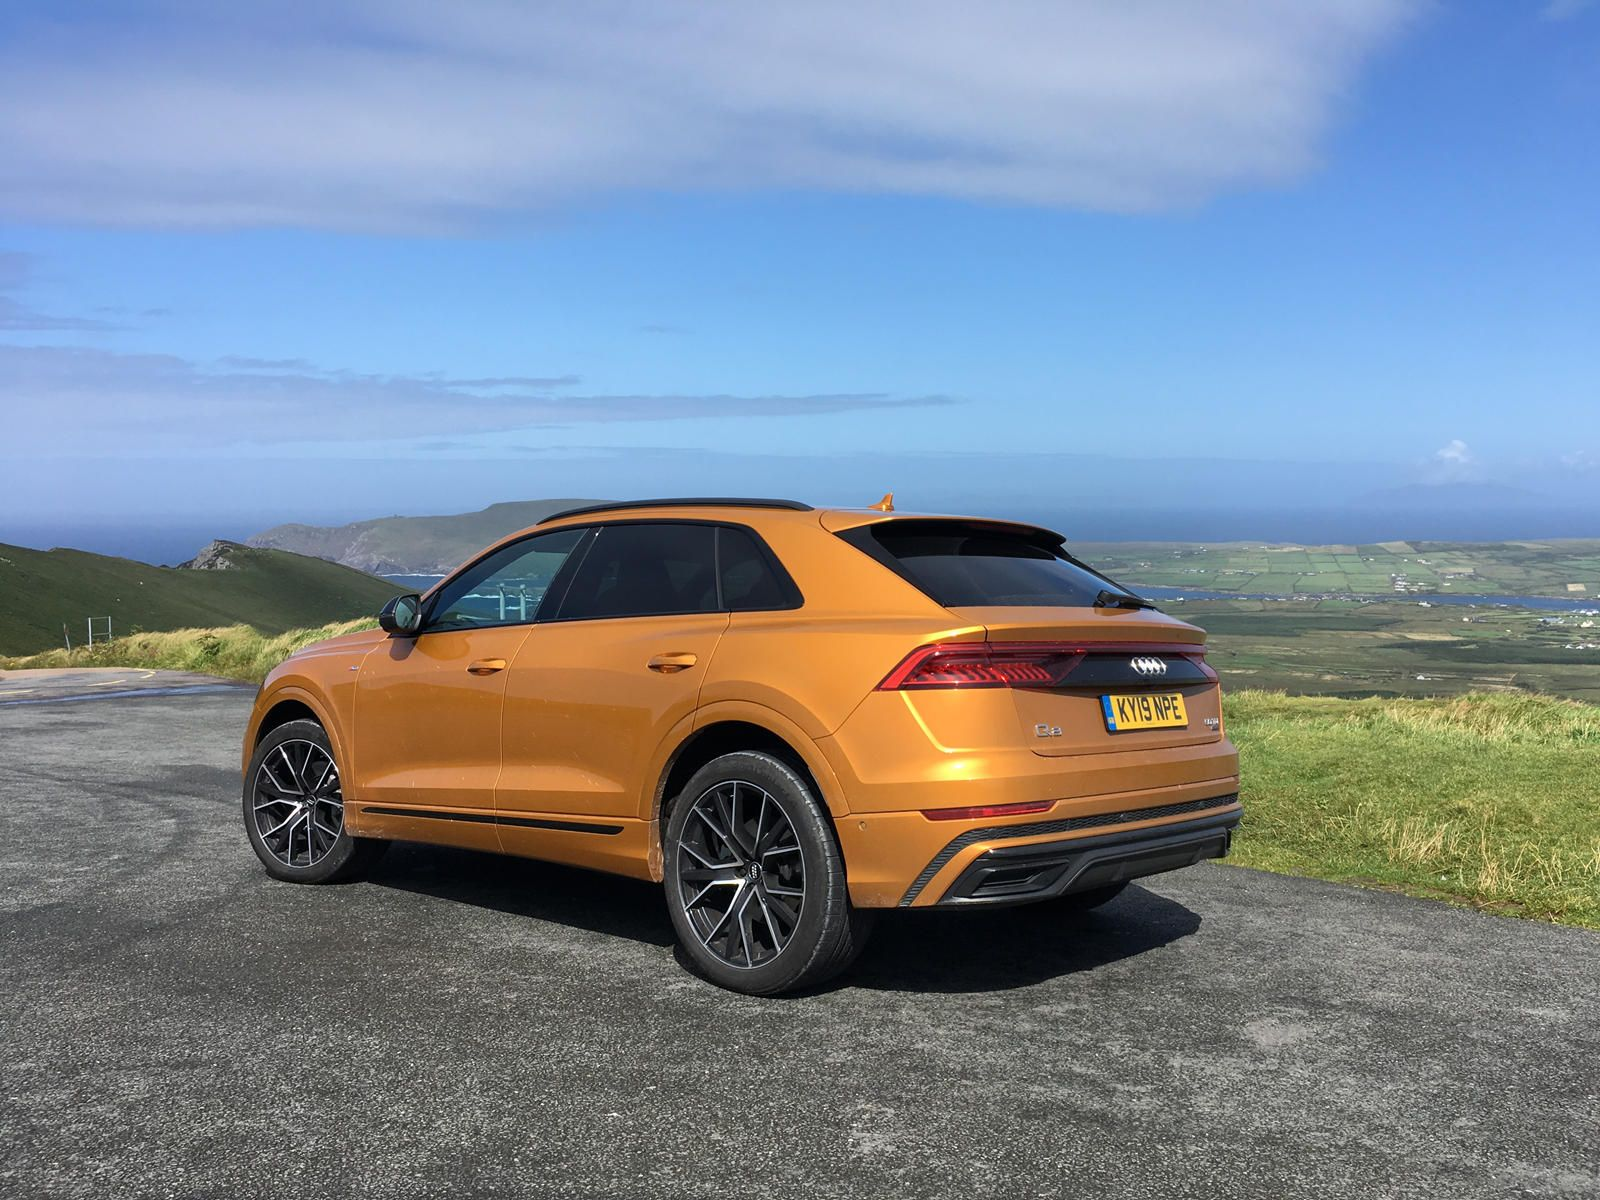 2019 Audi Q8 Rear Angle View Photo In 2020 Audi Fuel Economy Bmw X6